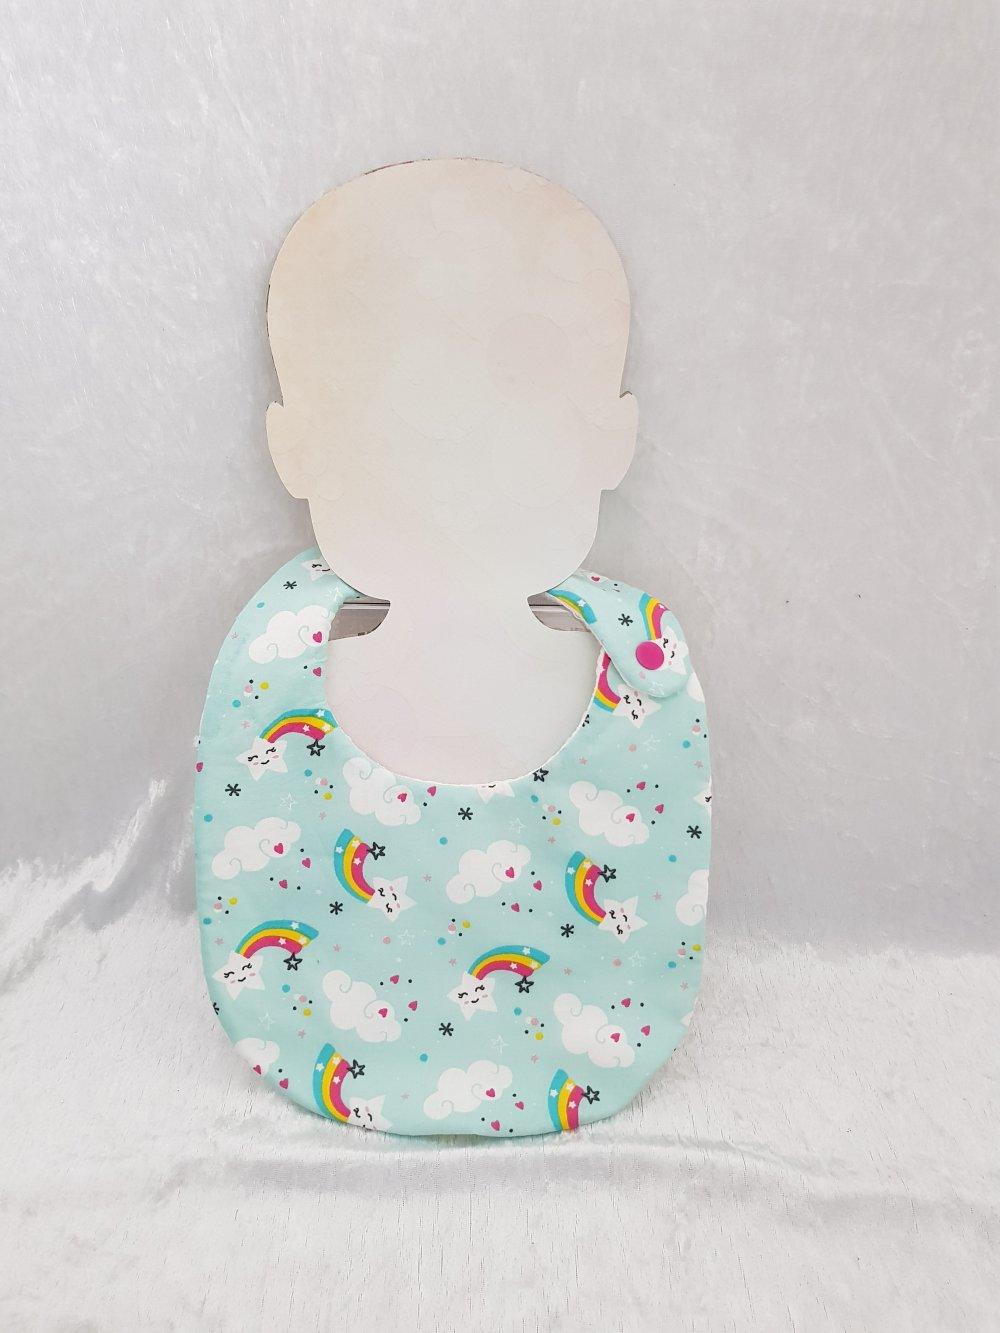 Bavoir bébé en tissu 0-18 mois